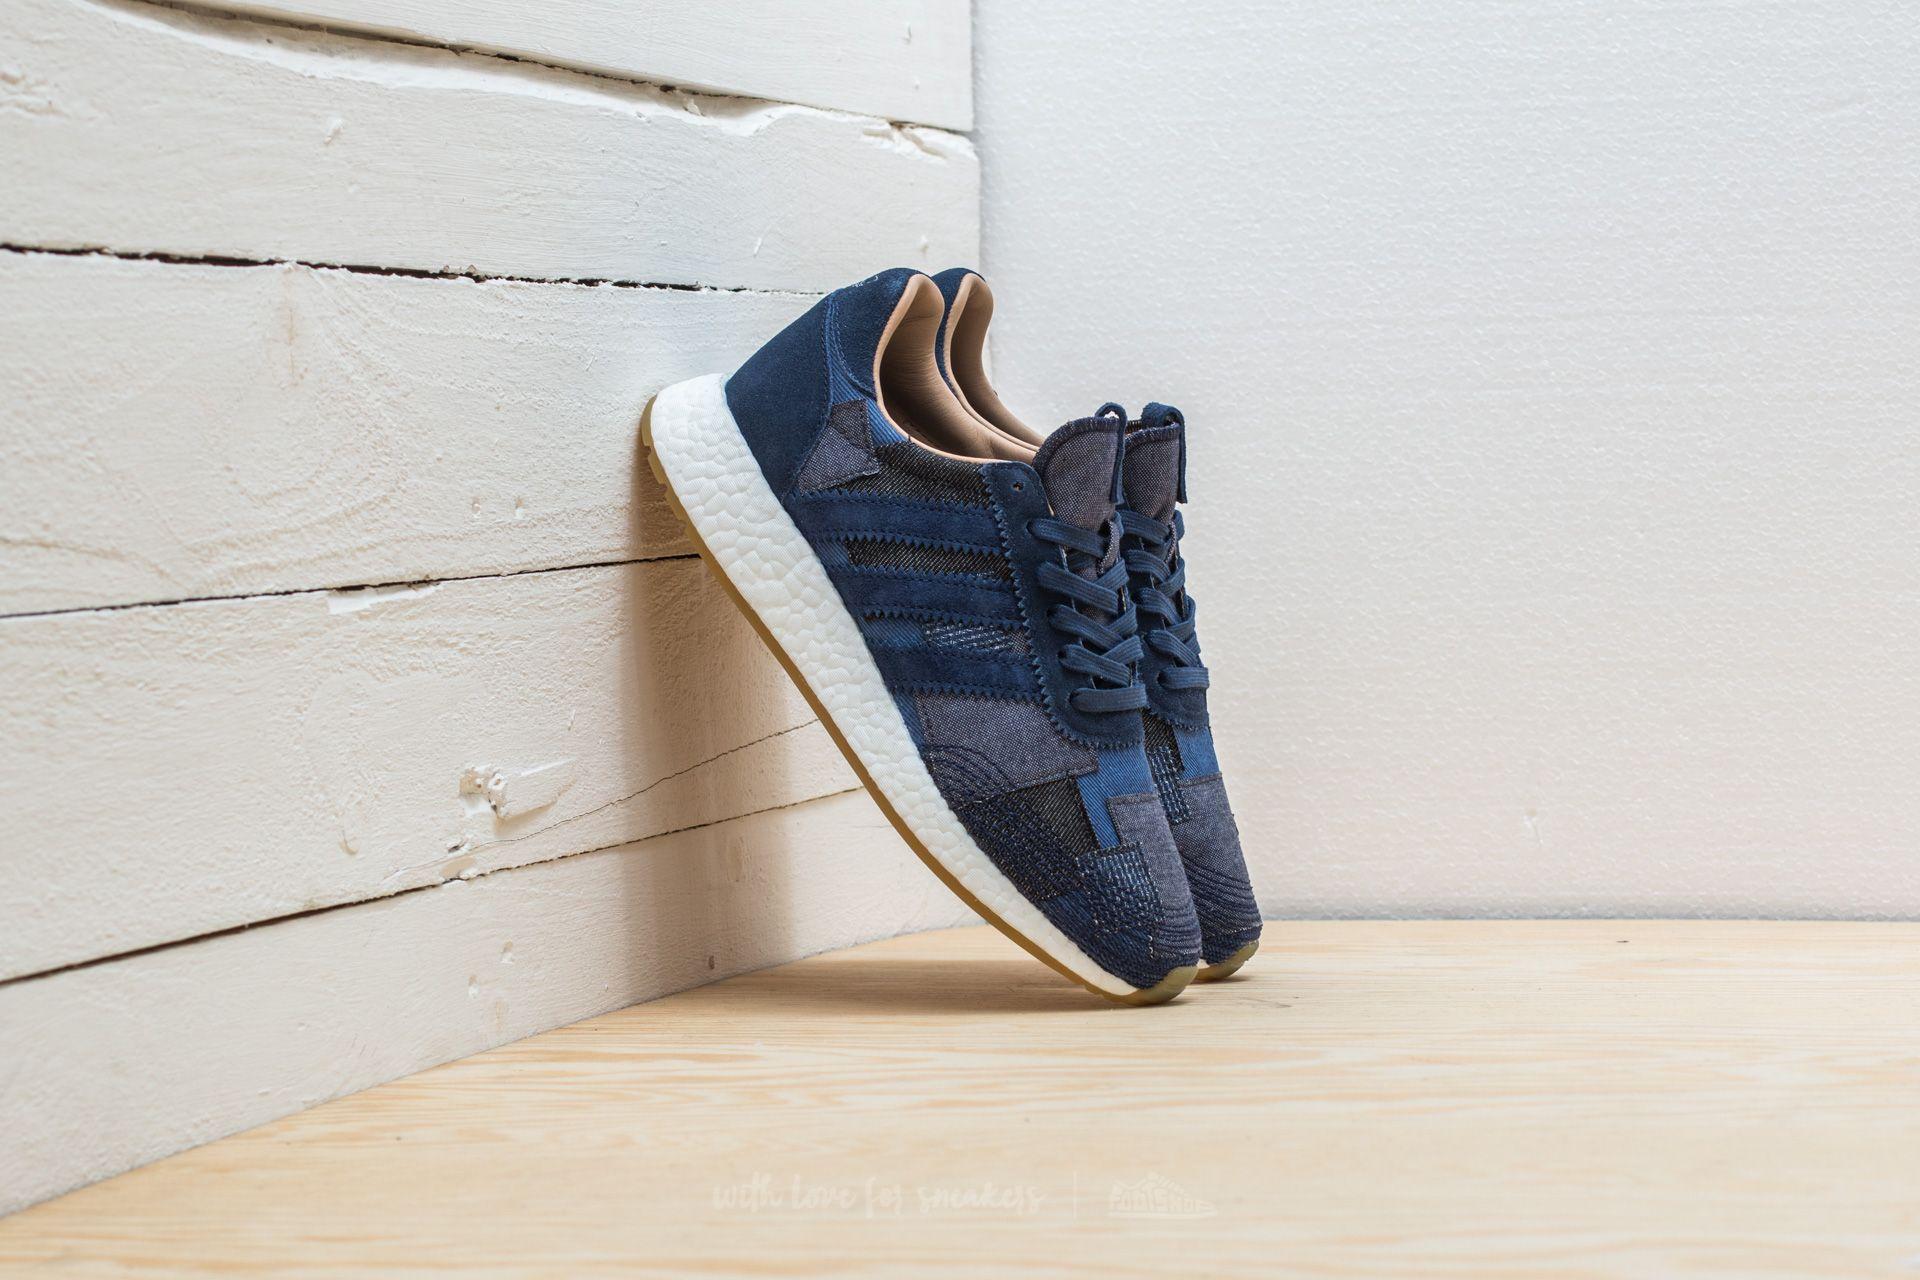 adidas Consortium x End x Bodega Iniki Runner S.E. Blue/ Tan - 17936